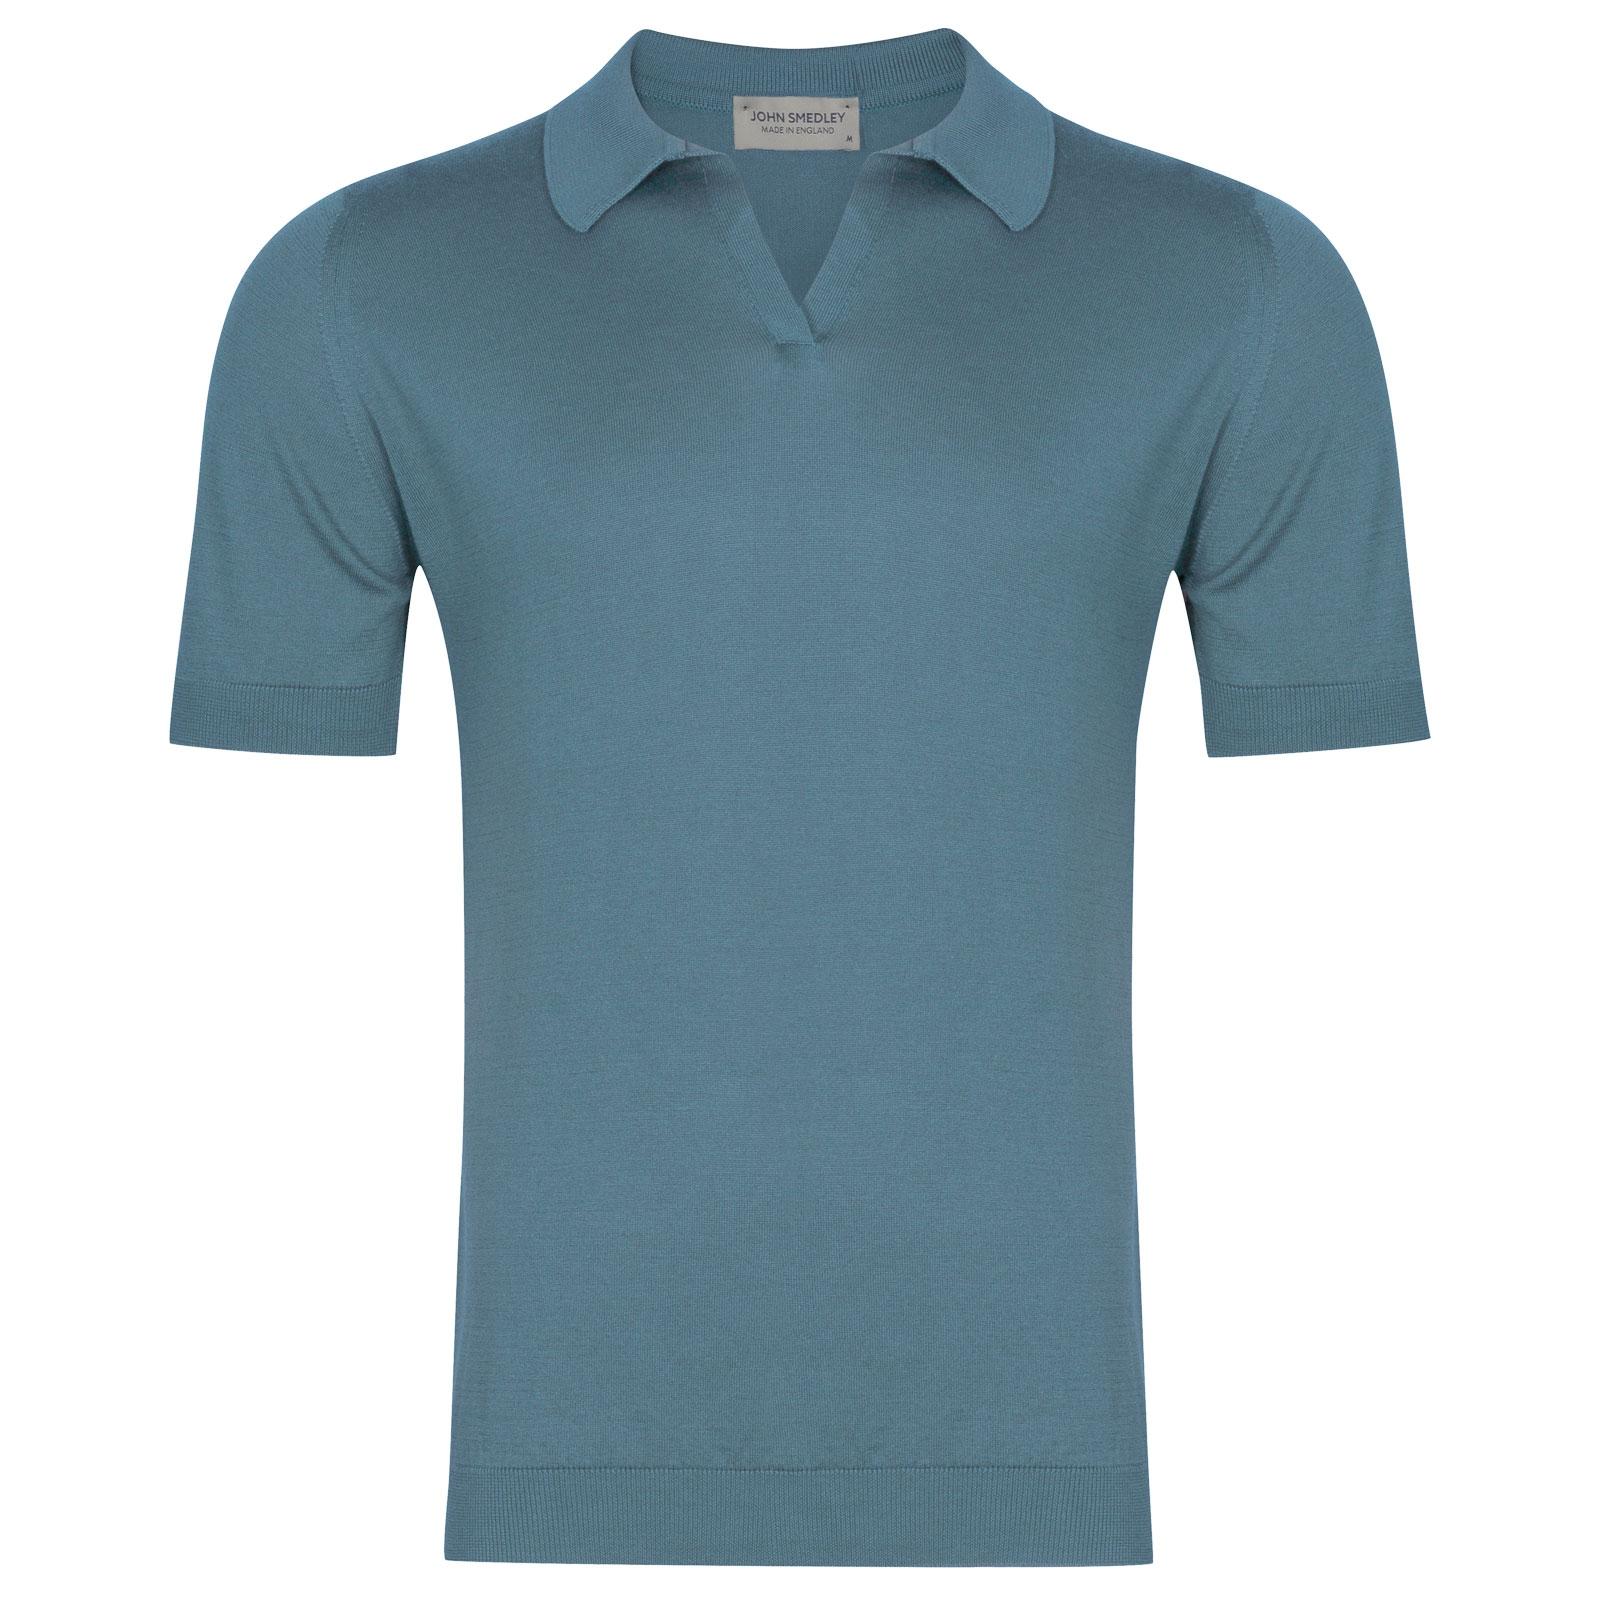 John Smedley Ancona in Dewdrop Blue Shirt-LGE